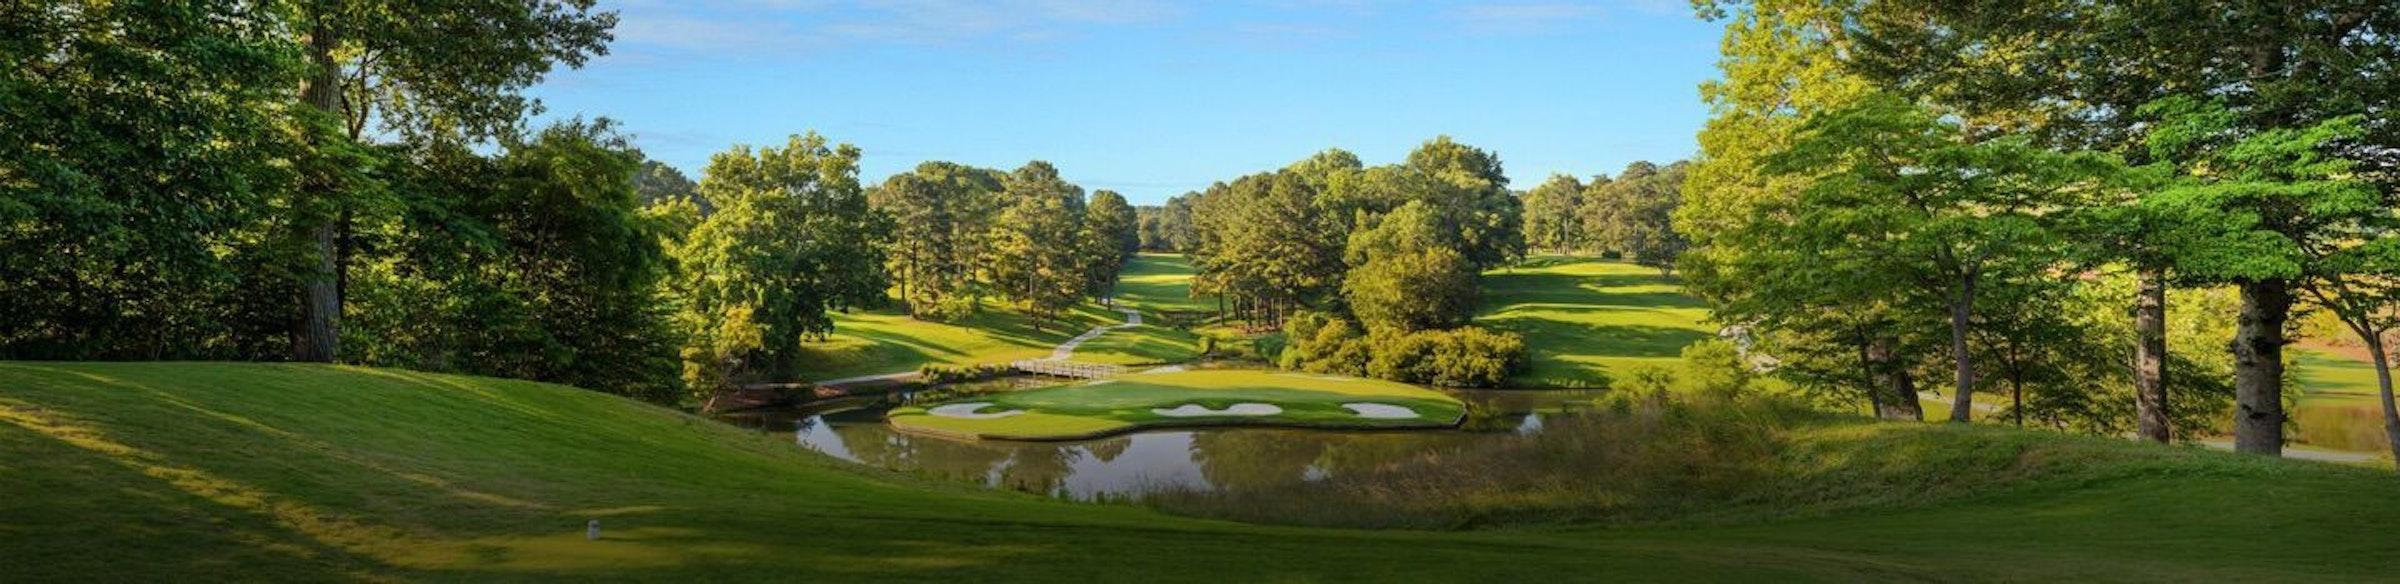 Tenison Park Golf Course in Beyond Dallas